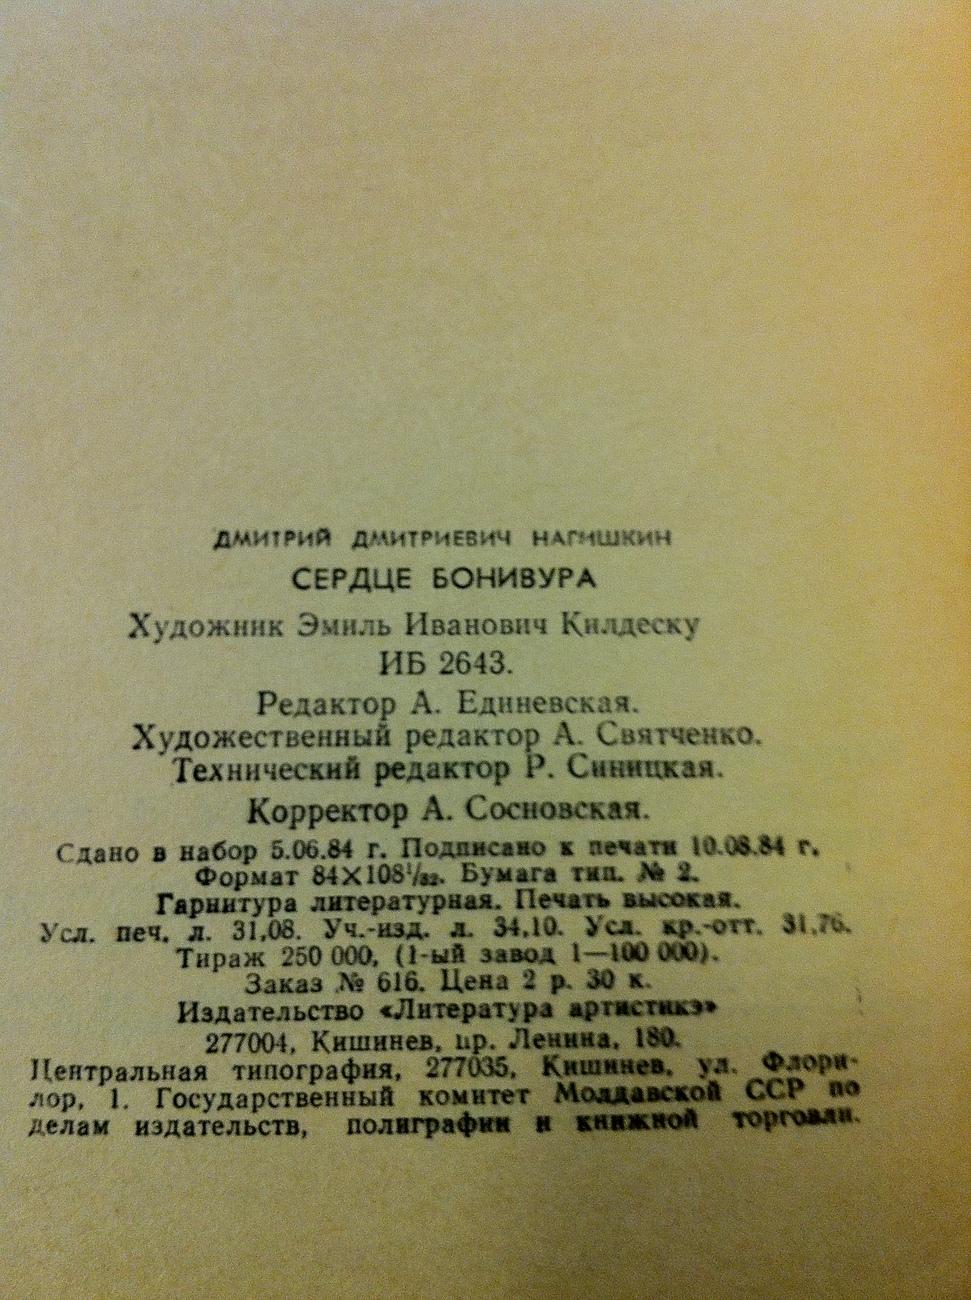 Дмитрий Нагишкин, Сер